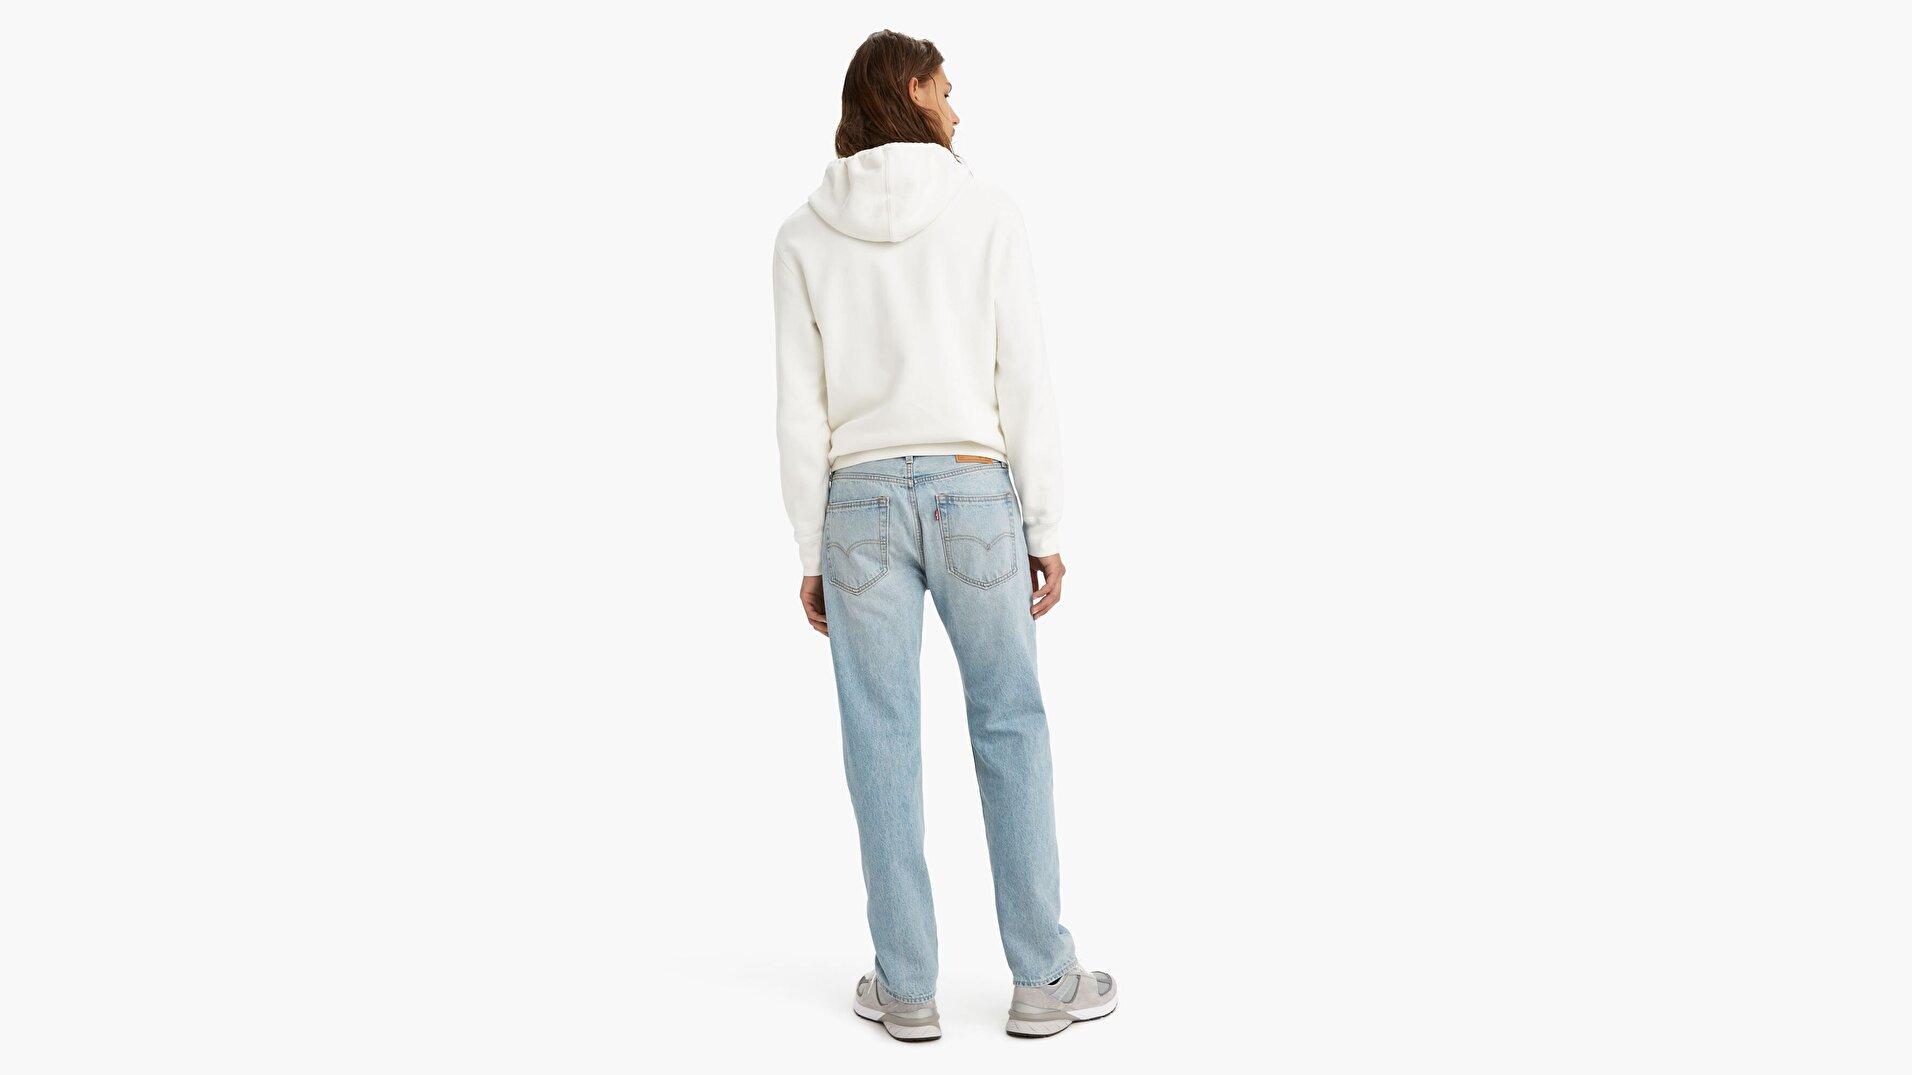 551Z™ Authentic Straight Erkek Jean Pantolon - Running Out Light Indigo